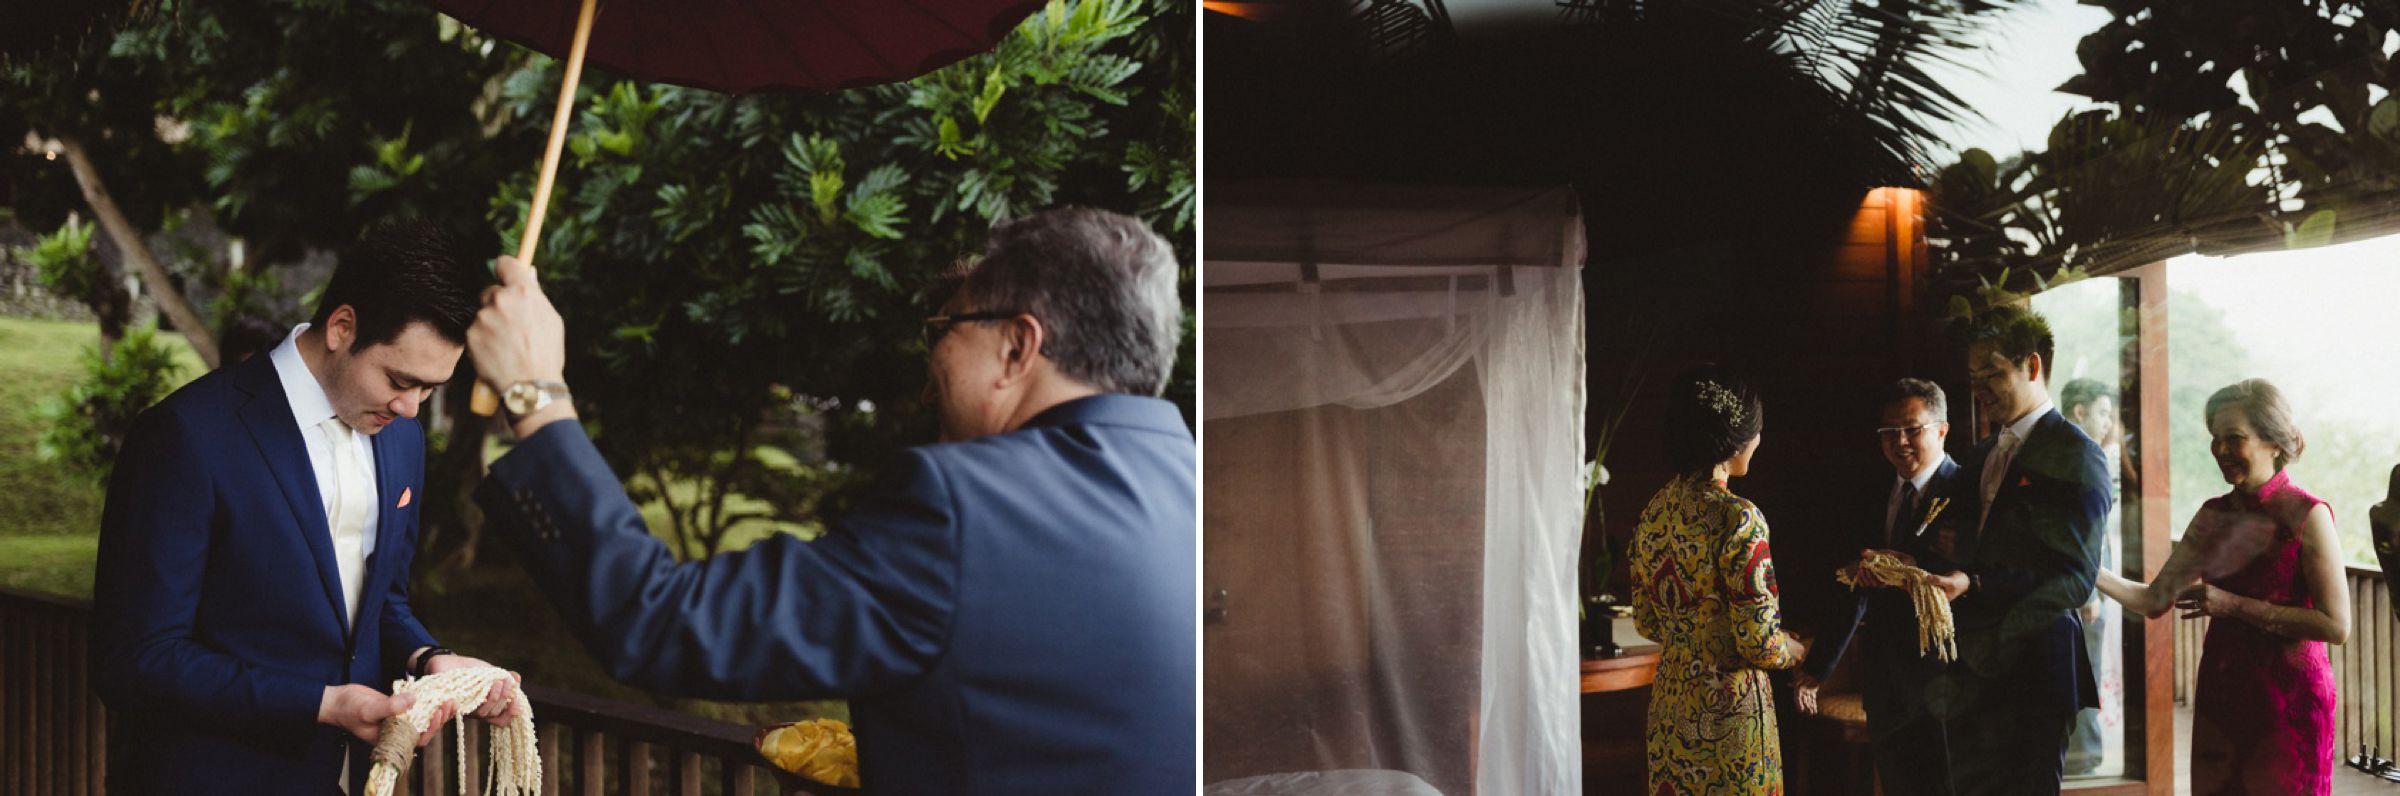 Tim-Danika-Bali-Wedding-Pyara-Photo-Evans 17.jpg